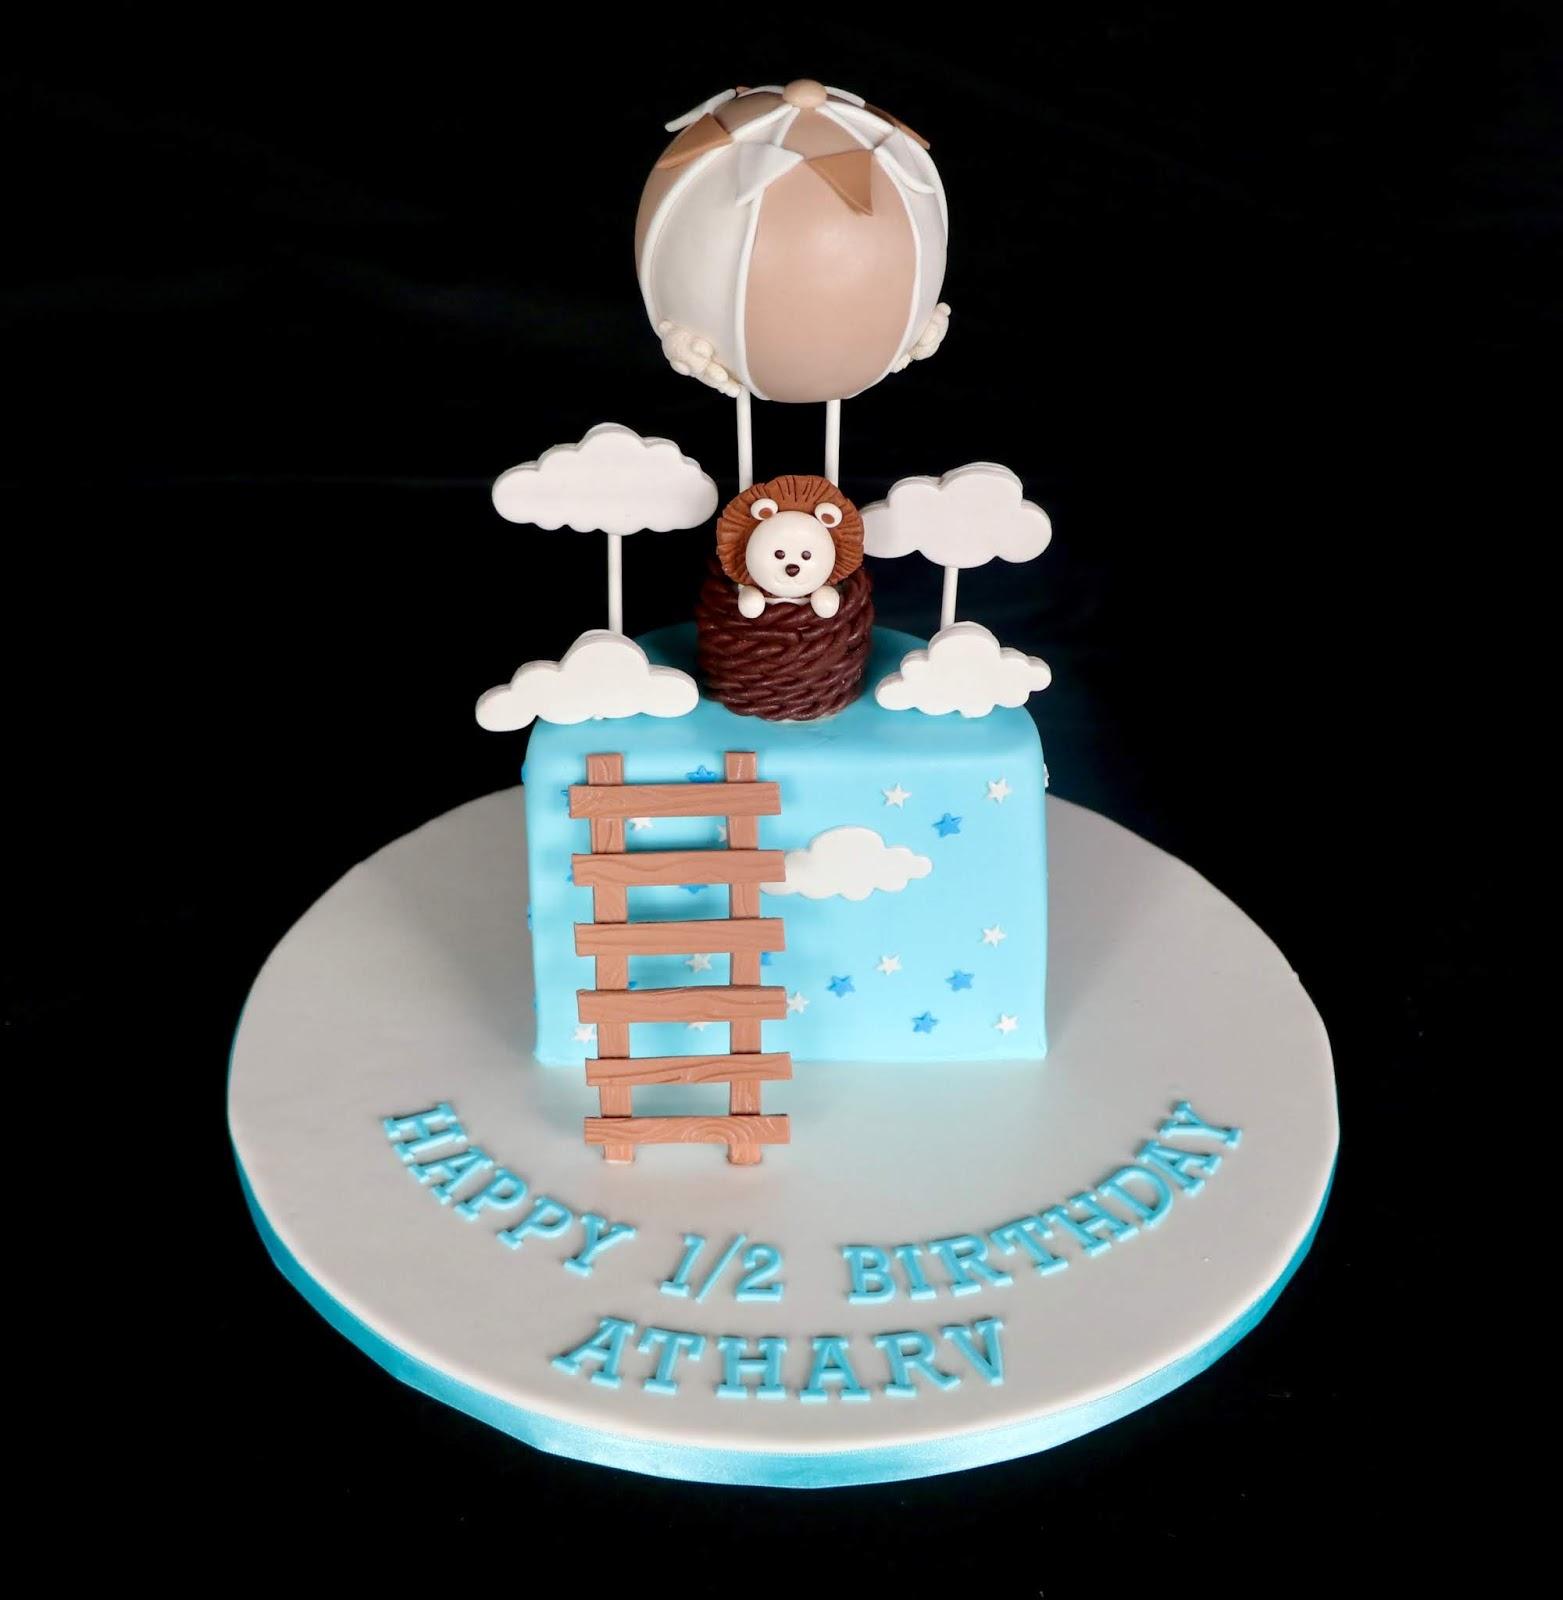 Swell Baking Maniac 1 2 Birthday Cake Funny Birthday Cards Online Aboleapandamsfinfo